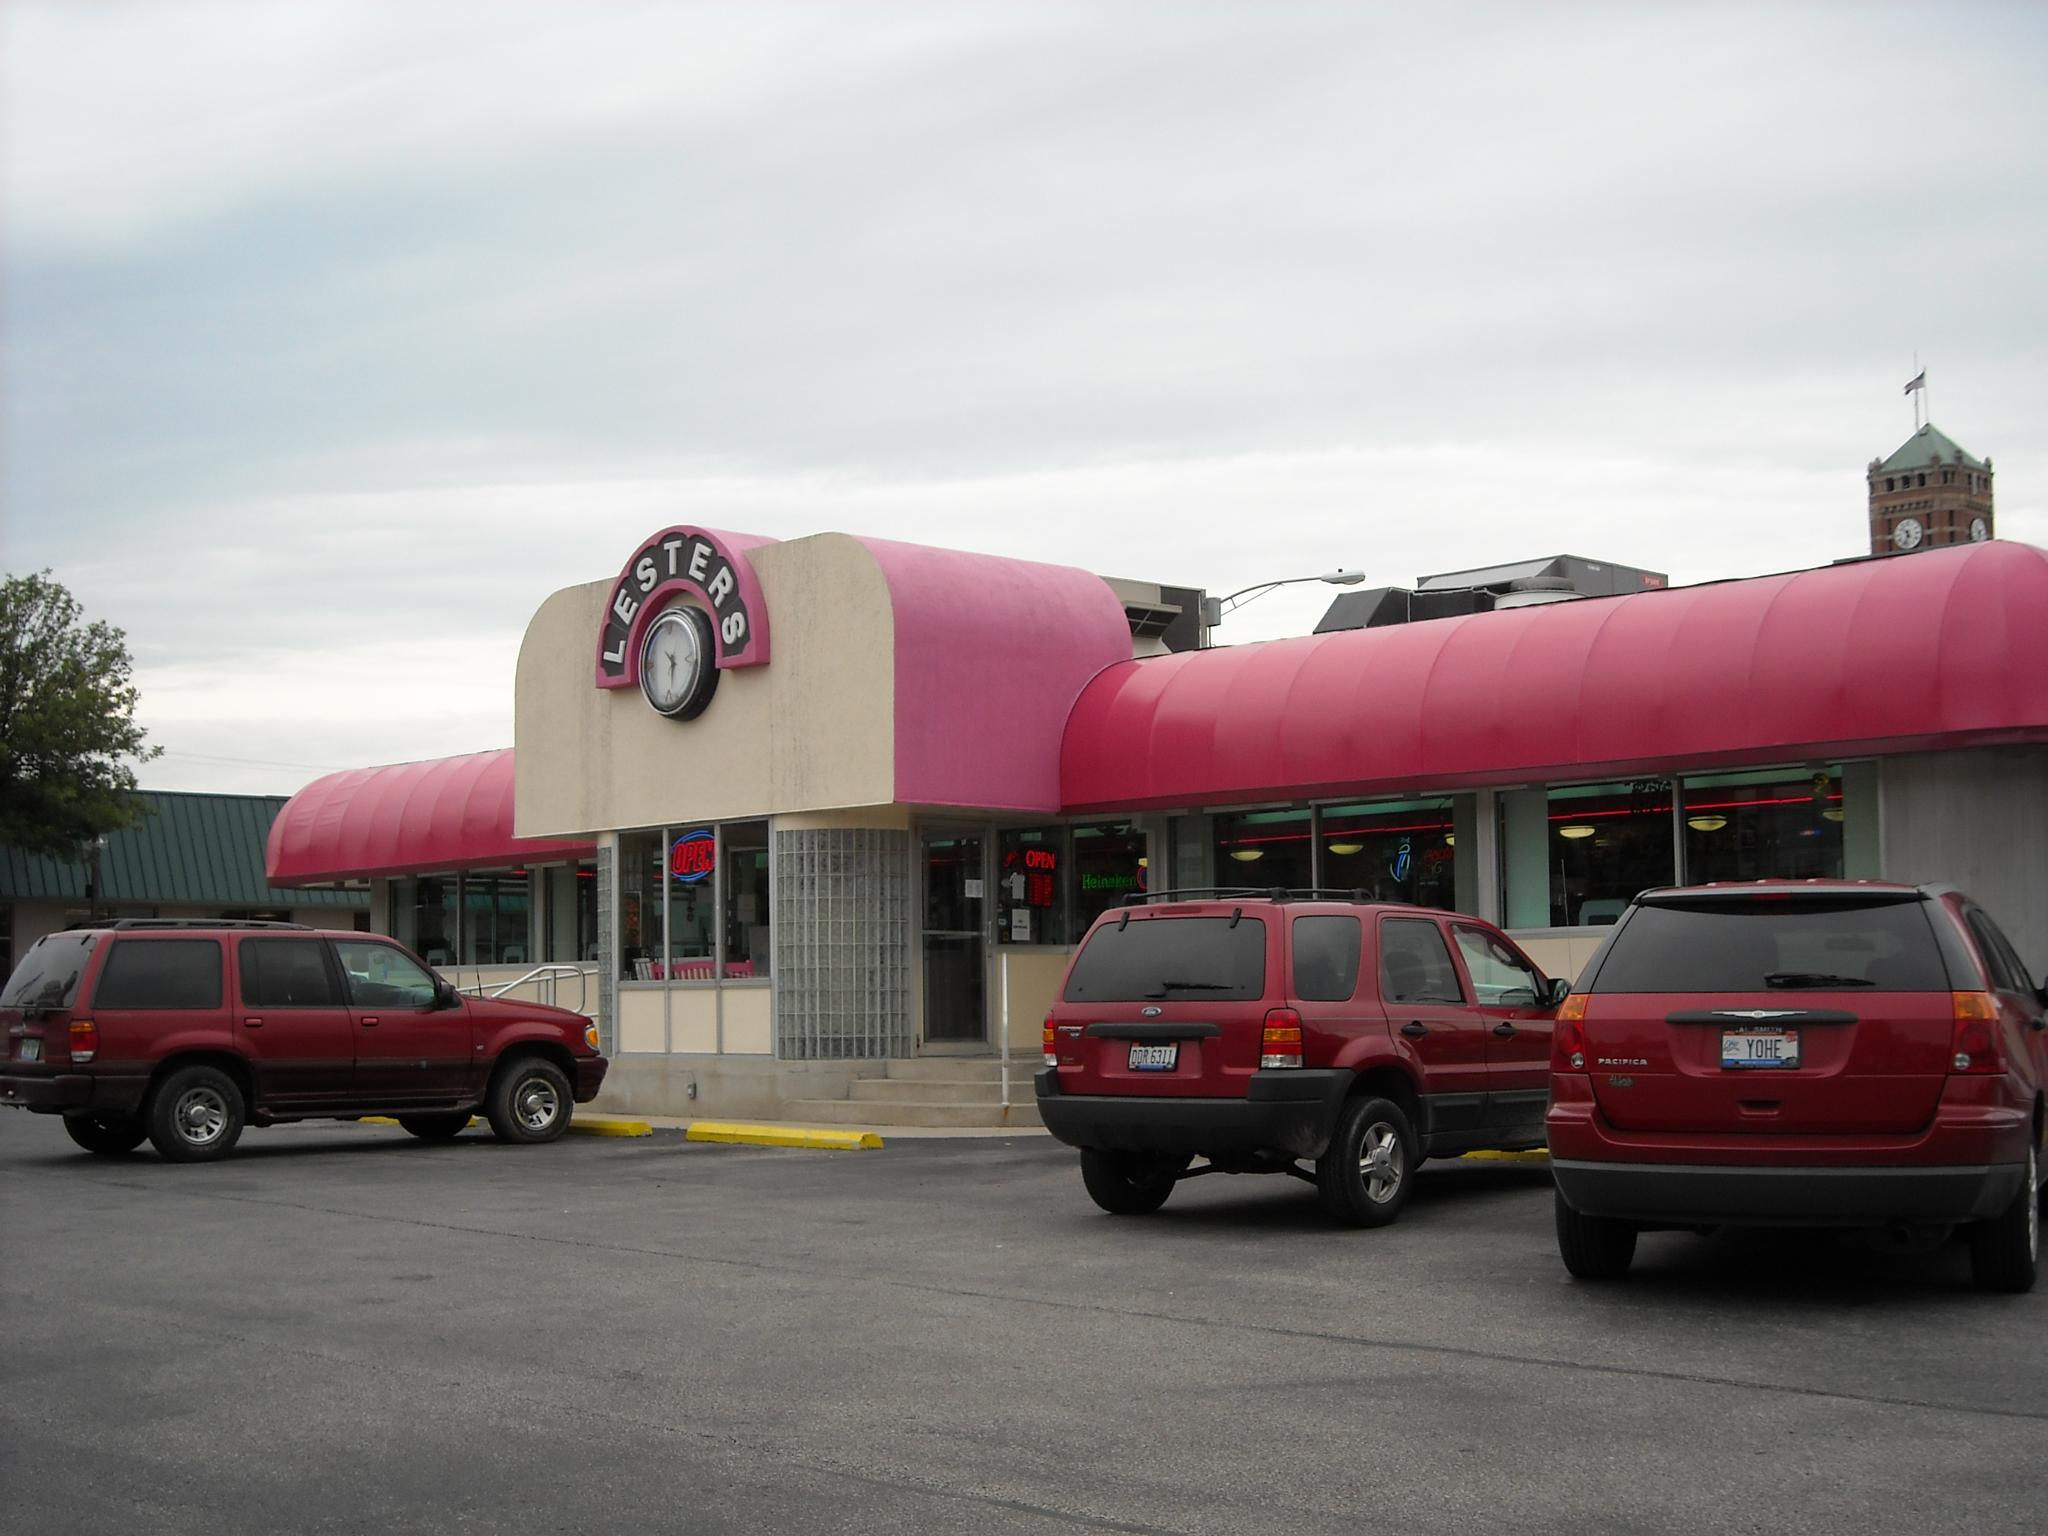 Lester's Diner Bryan,OH by sandi.mcclain.5